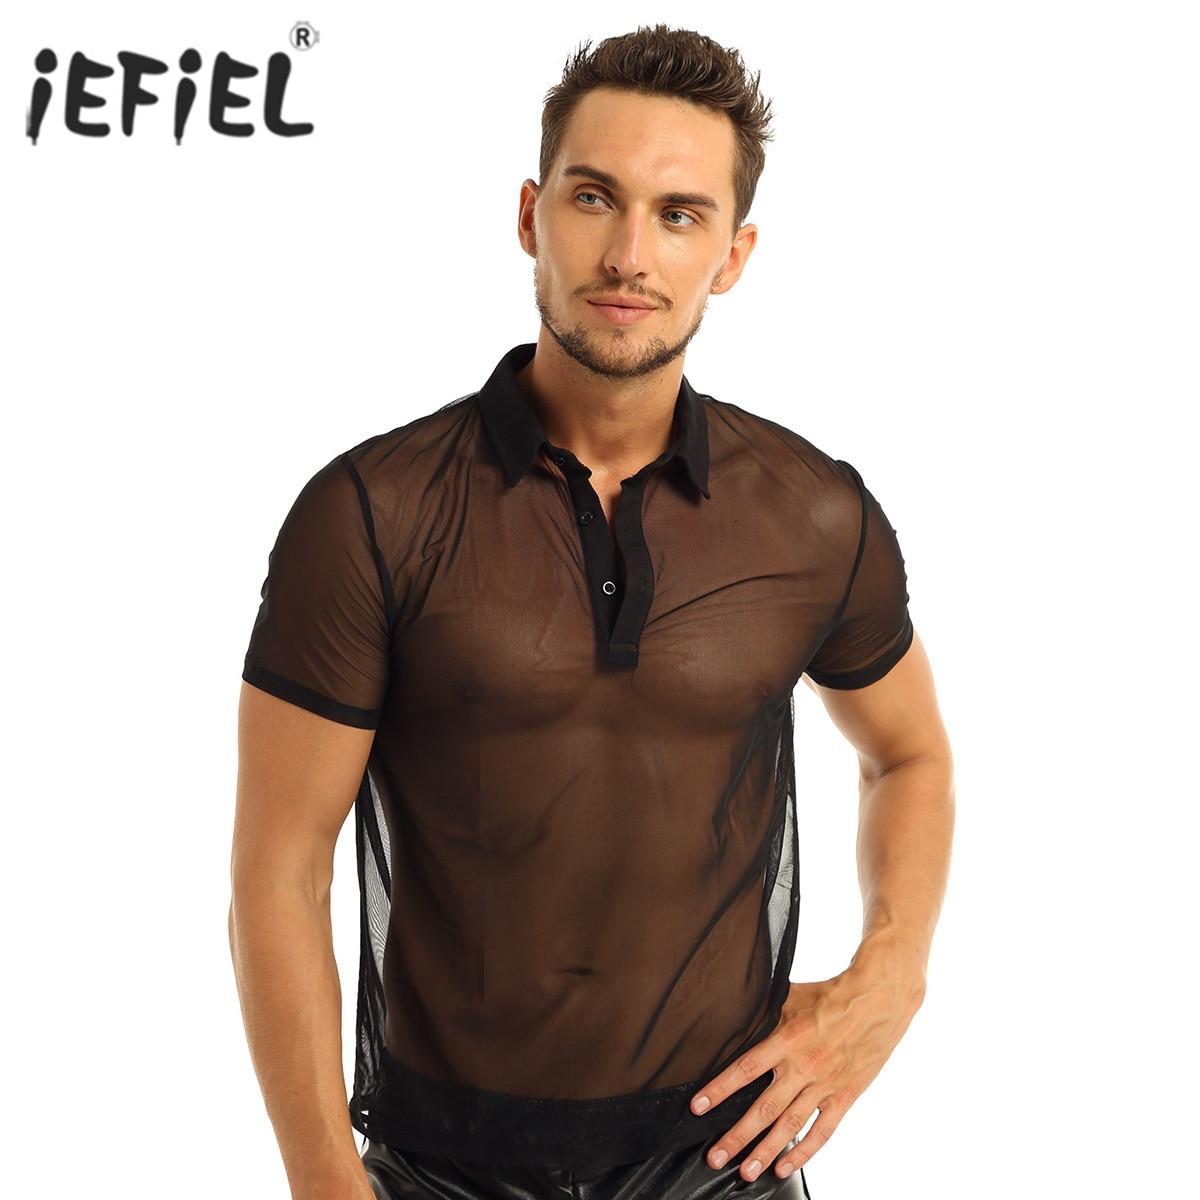 Sexy camiseta de malha transparente masculino tops fitness wrestling singlets erótico mangas curtas turn-down coletes masculinos